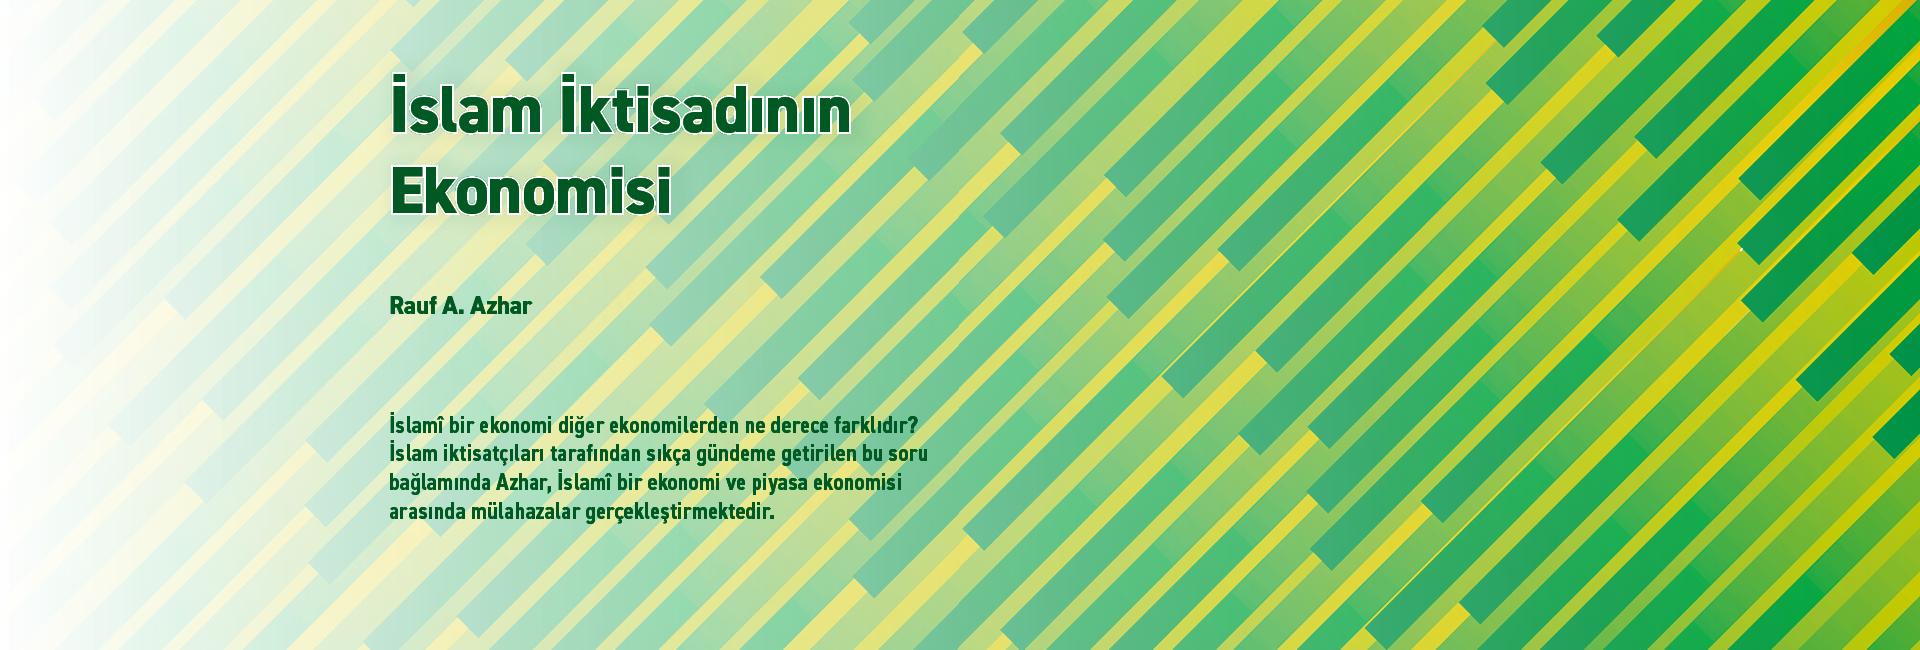 http://iktisatyayinlari.com/content/1-home/iiekonomisi_web.jpg